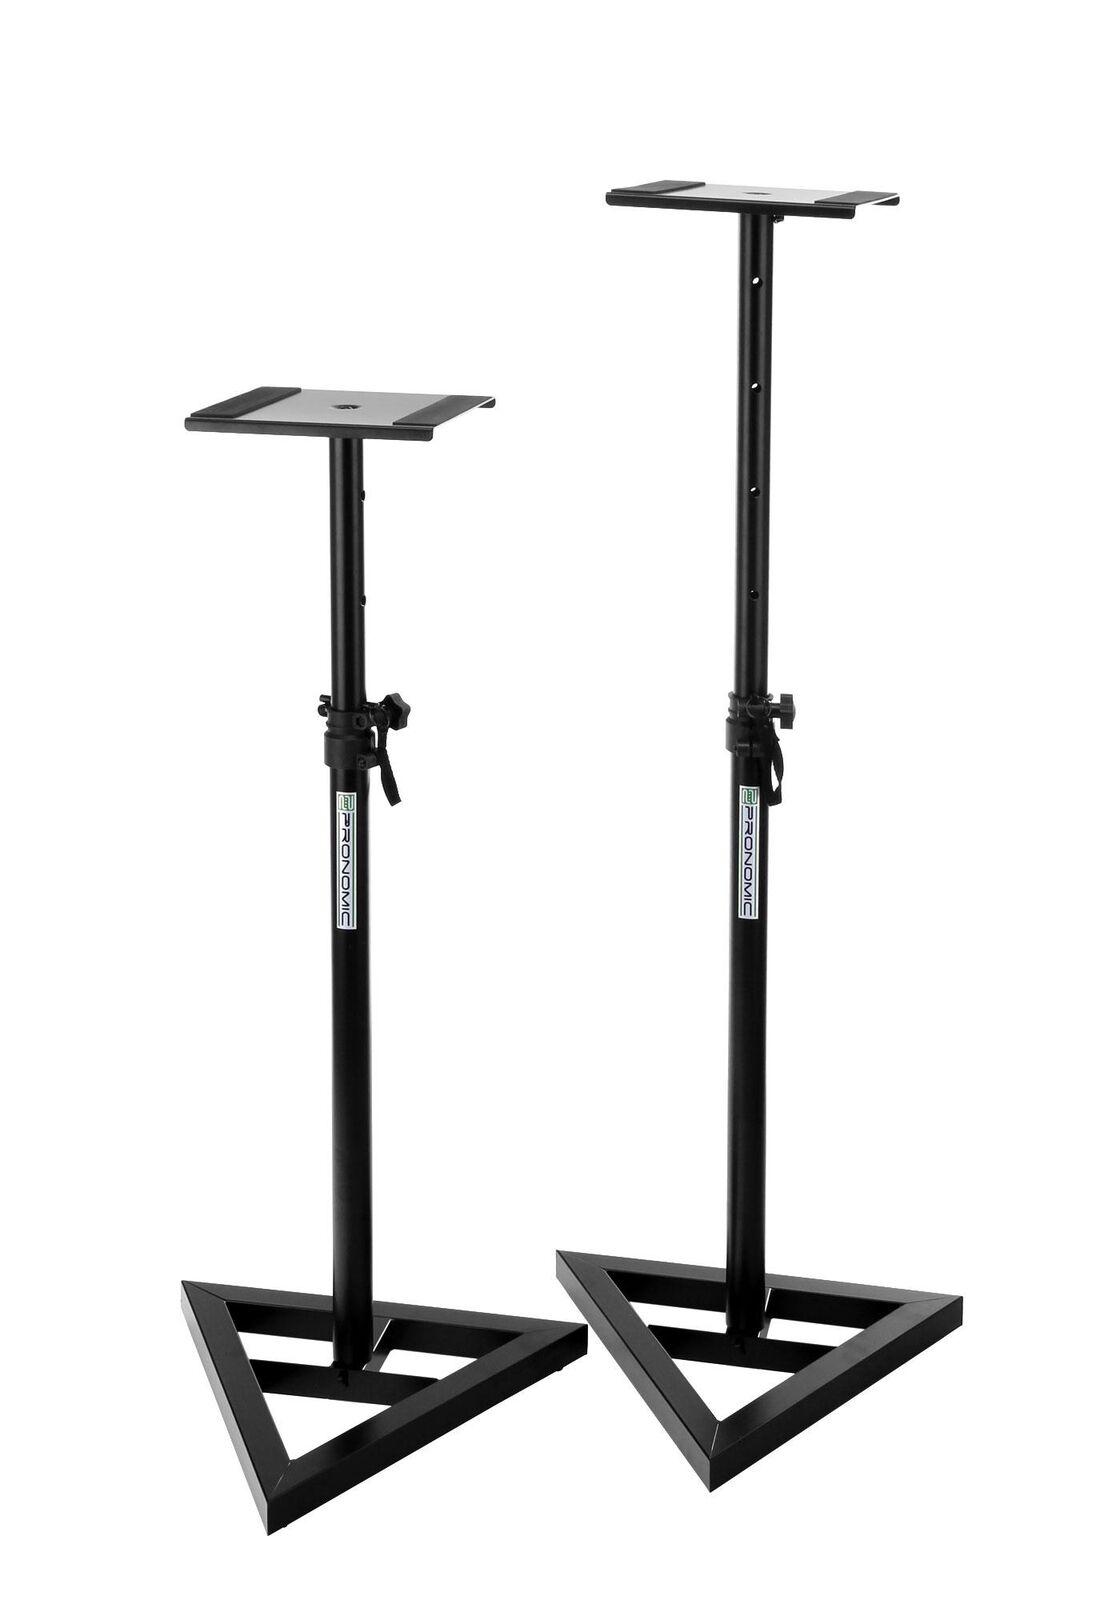 2x Soporte Estante para Altavoce Monitor DJ PA Stativo Estudio Reglable 80-130cm